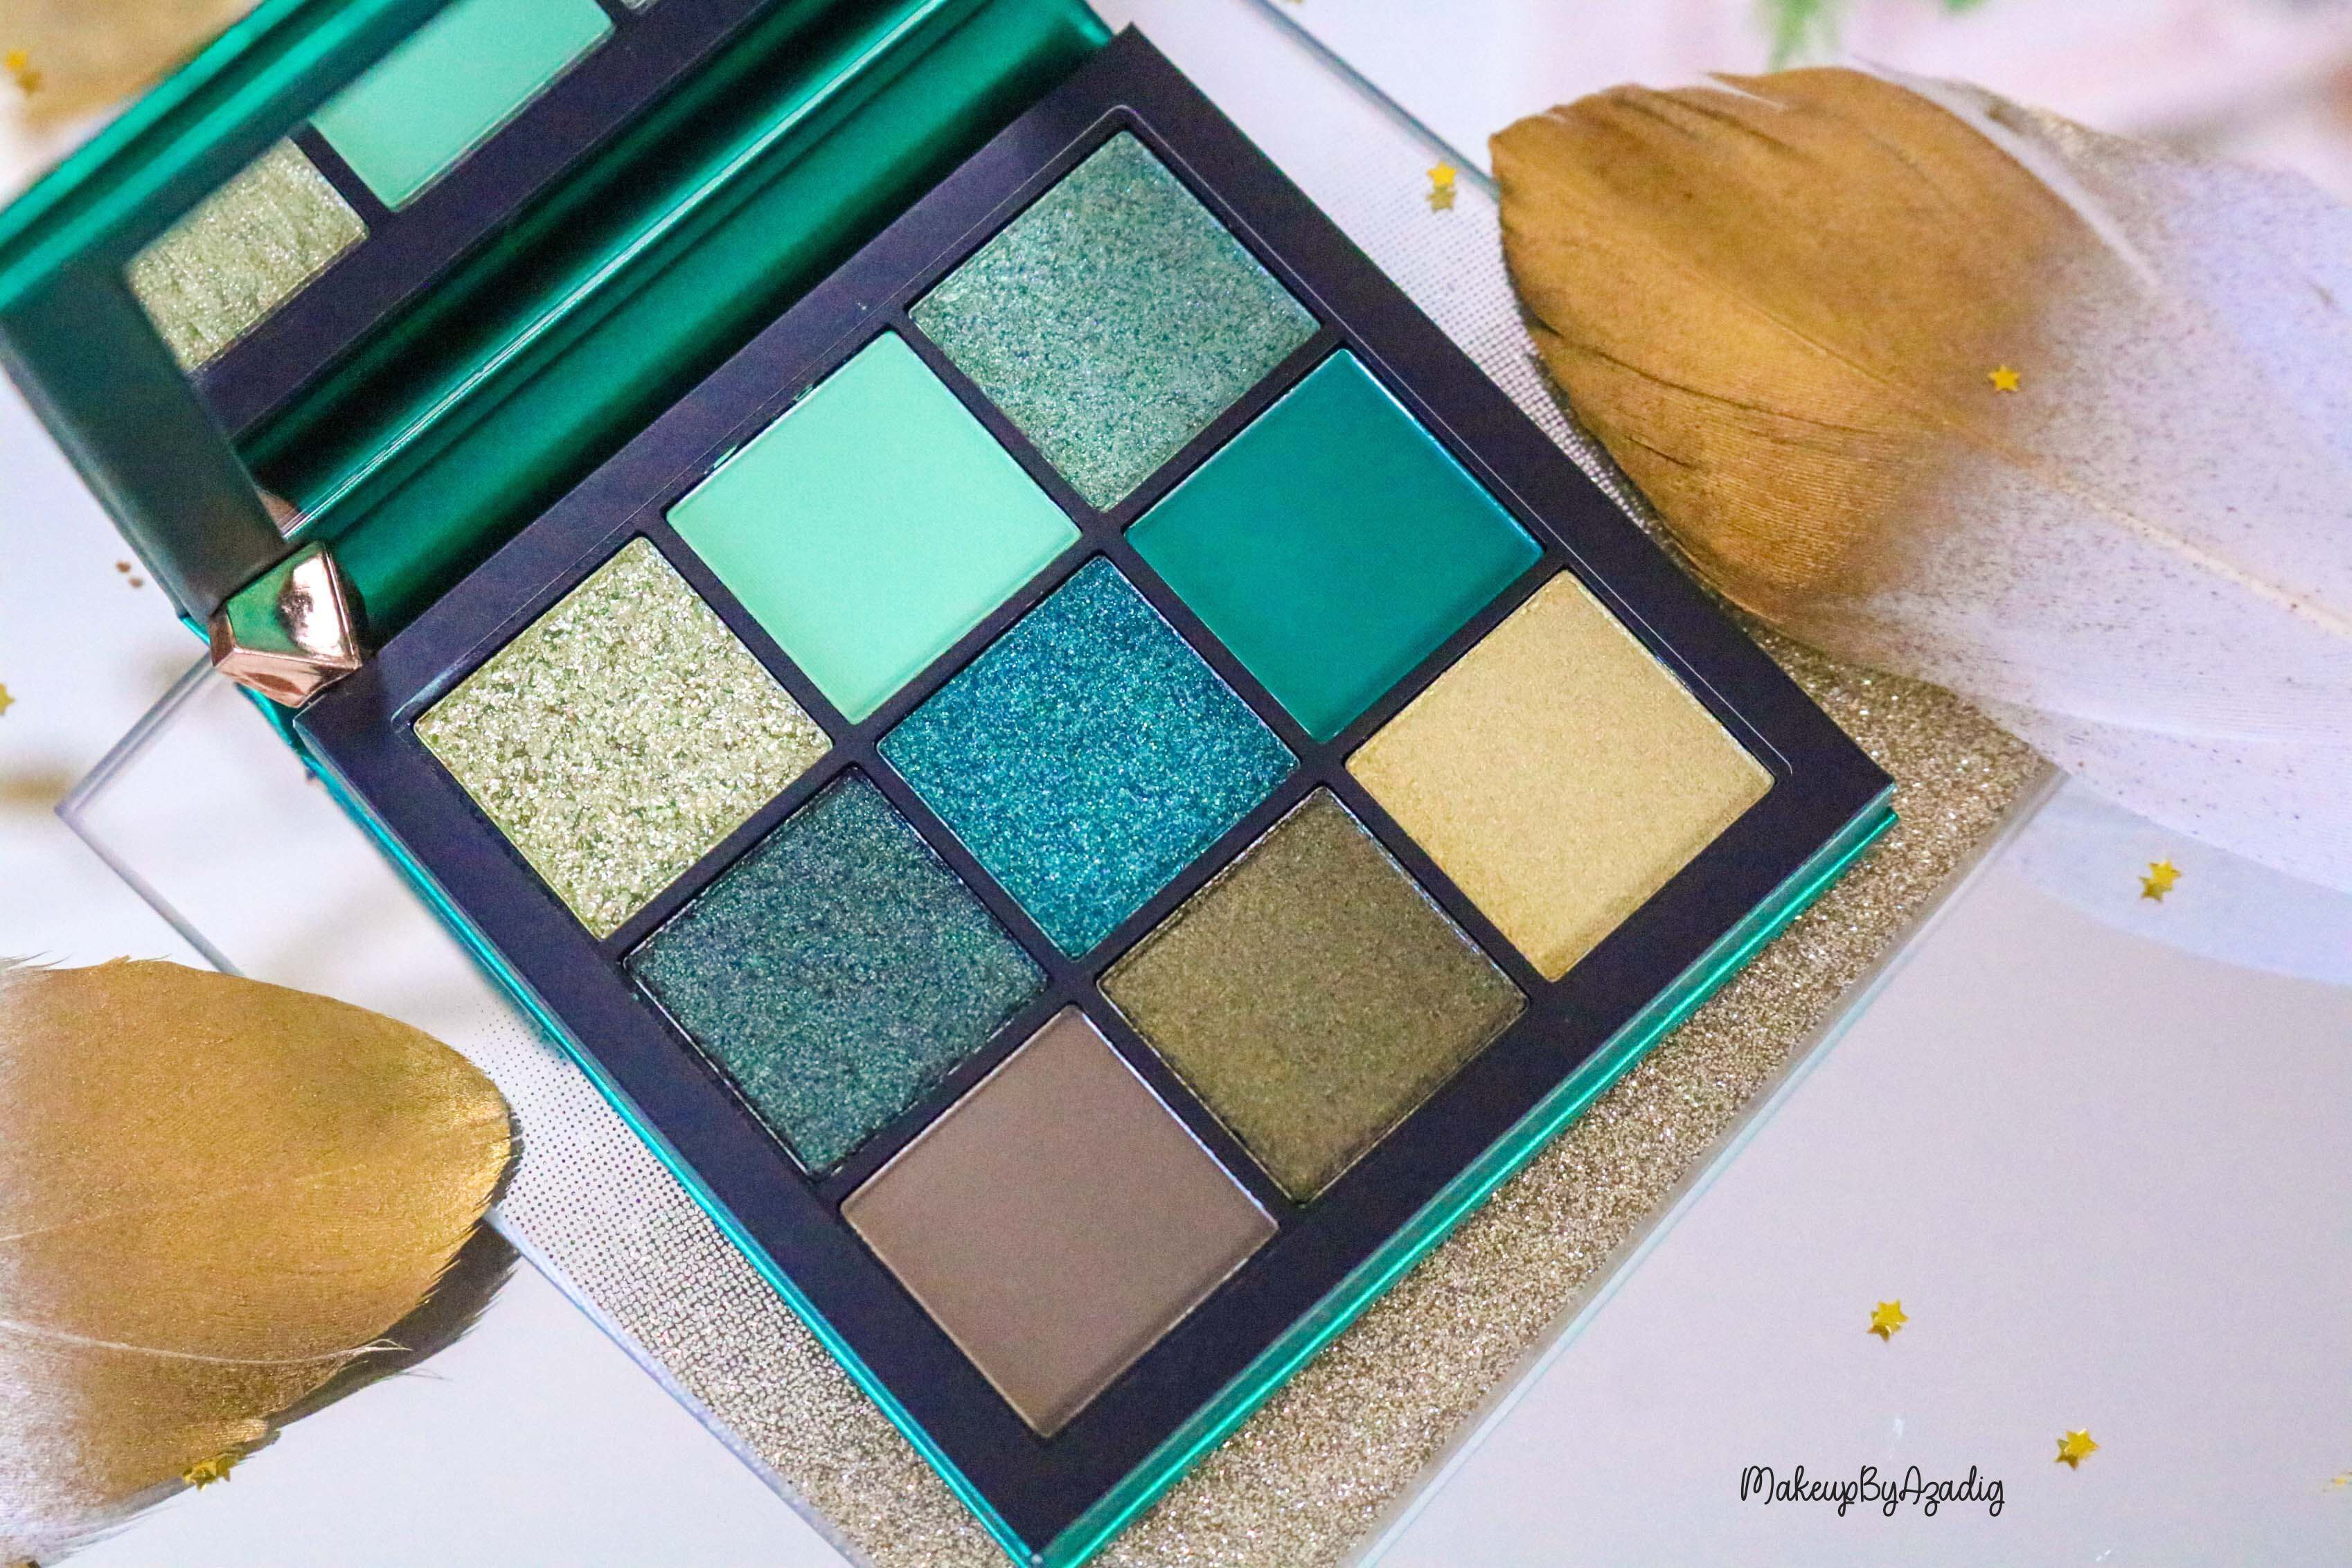 revue-review-palette-emerald-obsessions-huda-beauty-topaz-sapphire-avis-prix-swatch-makeupbyazadig-meilleure-dubai